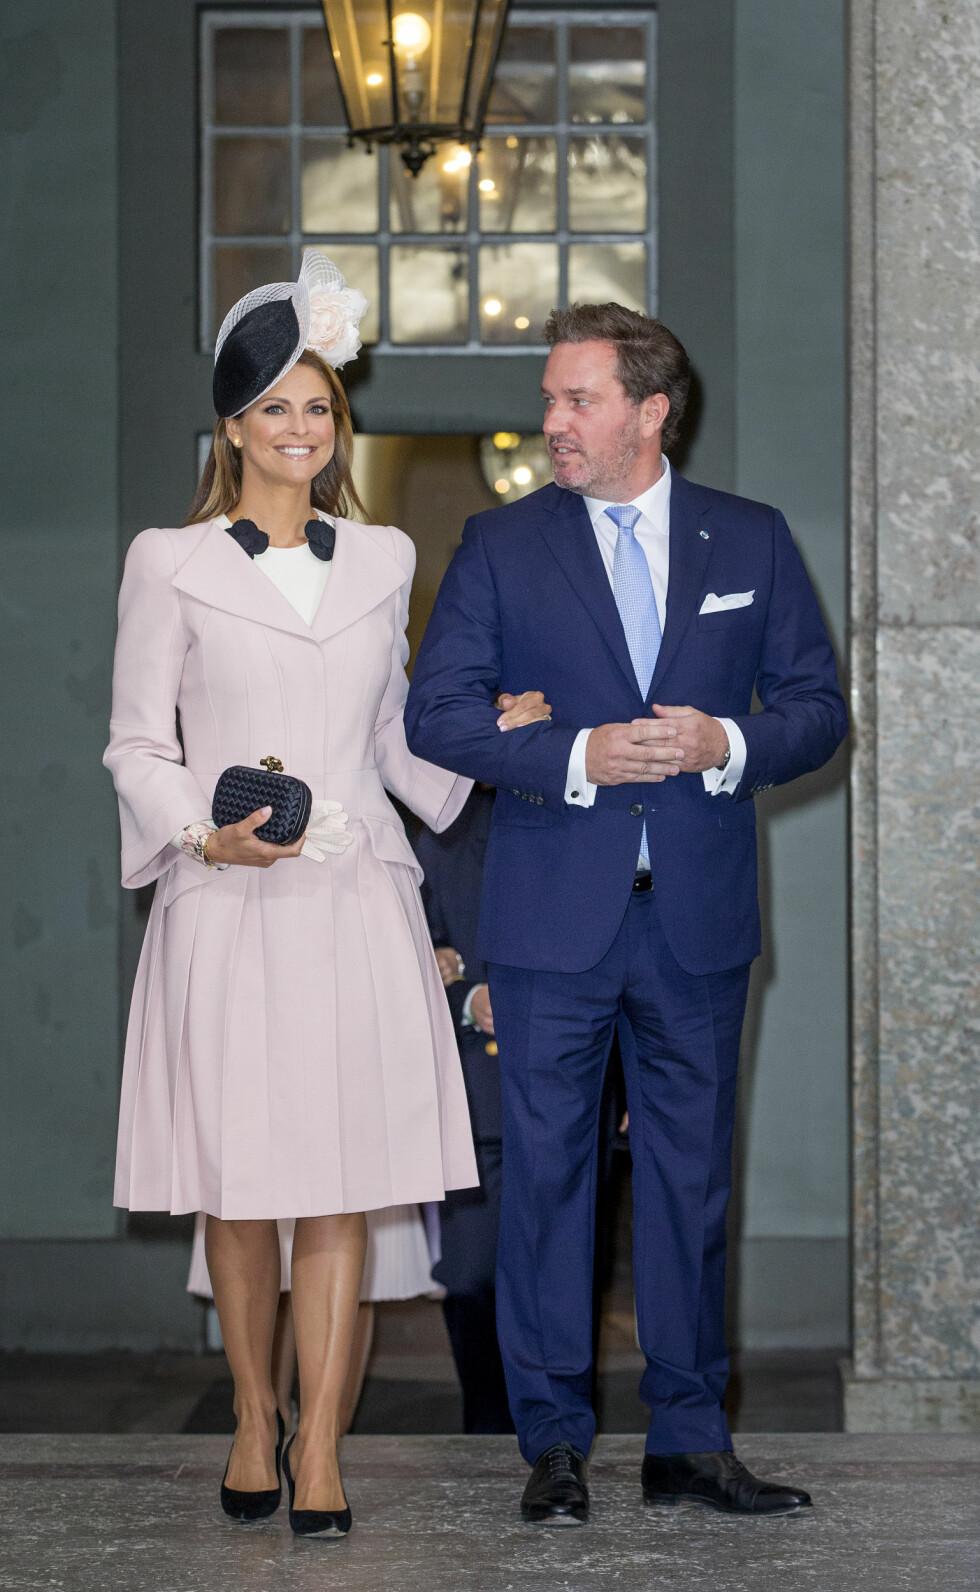 BARNEFRI: Prinsesse Madeleine og Chris O'Neill kom uten barna prinsesse Leonore og prins Nicolas. Foto: DPA